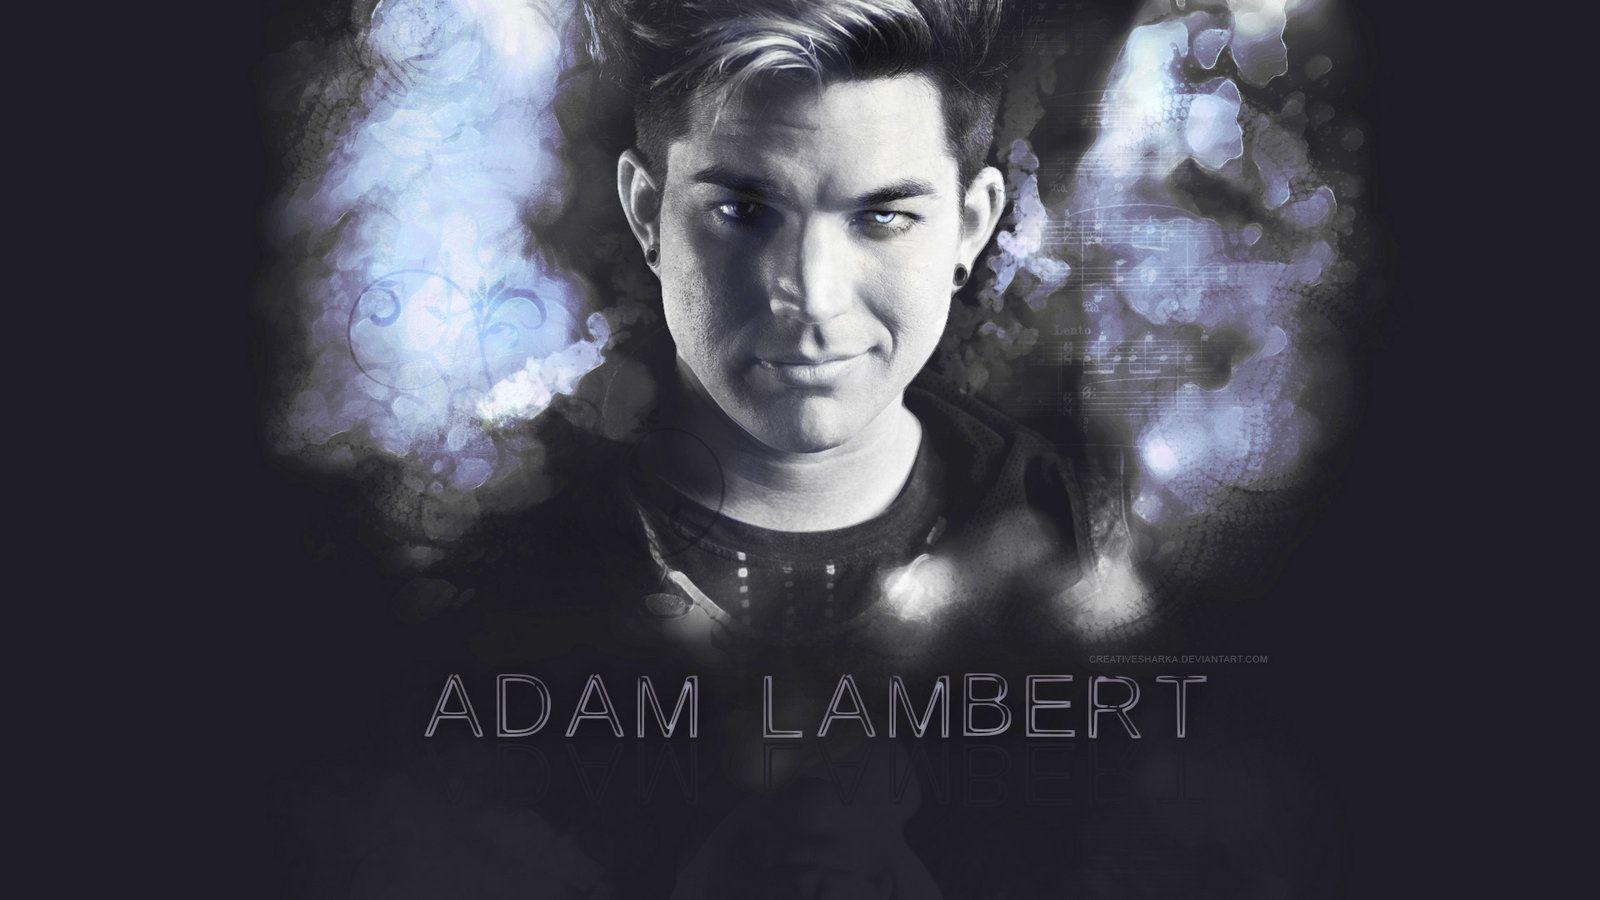 lambert wallpaper adam - photo #12